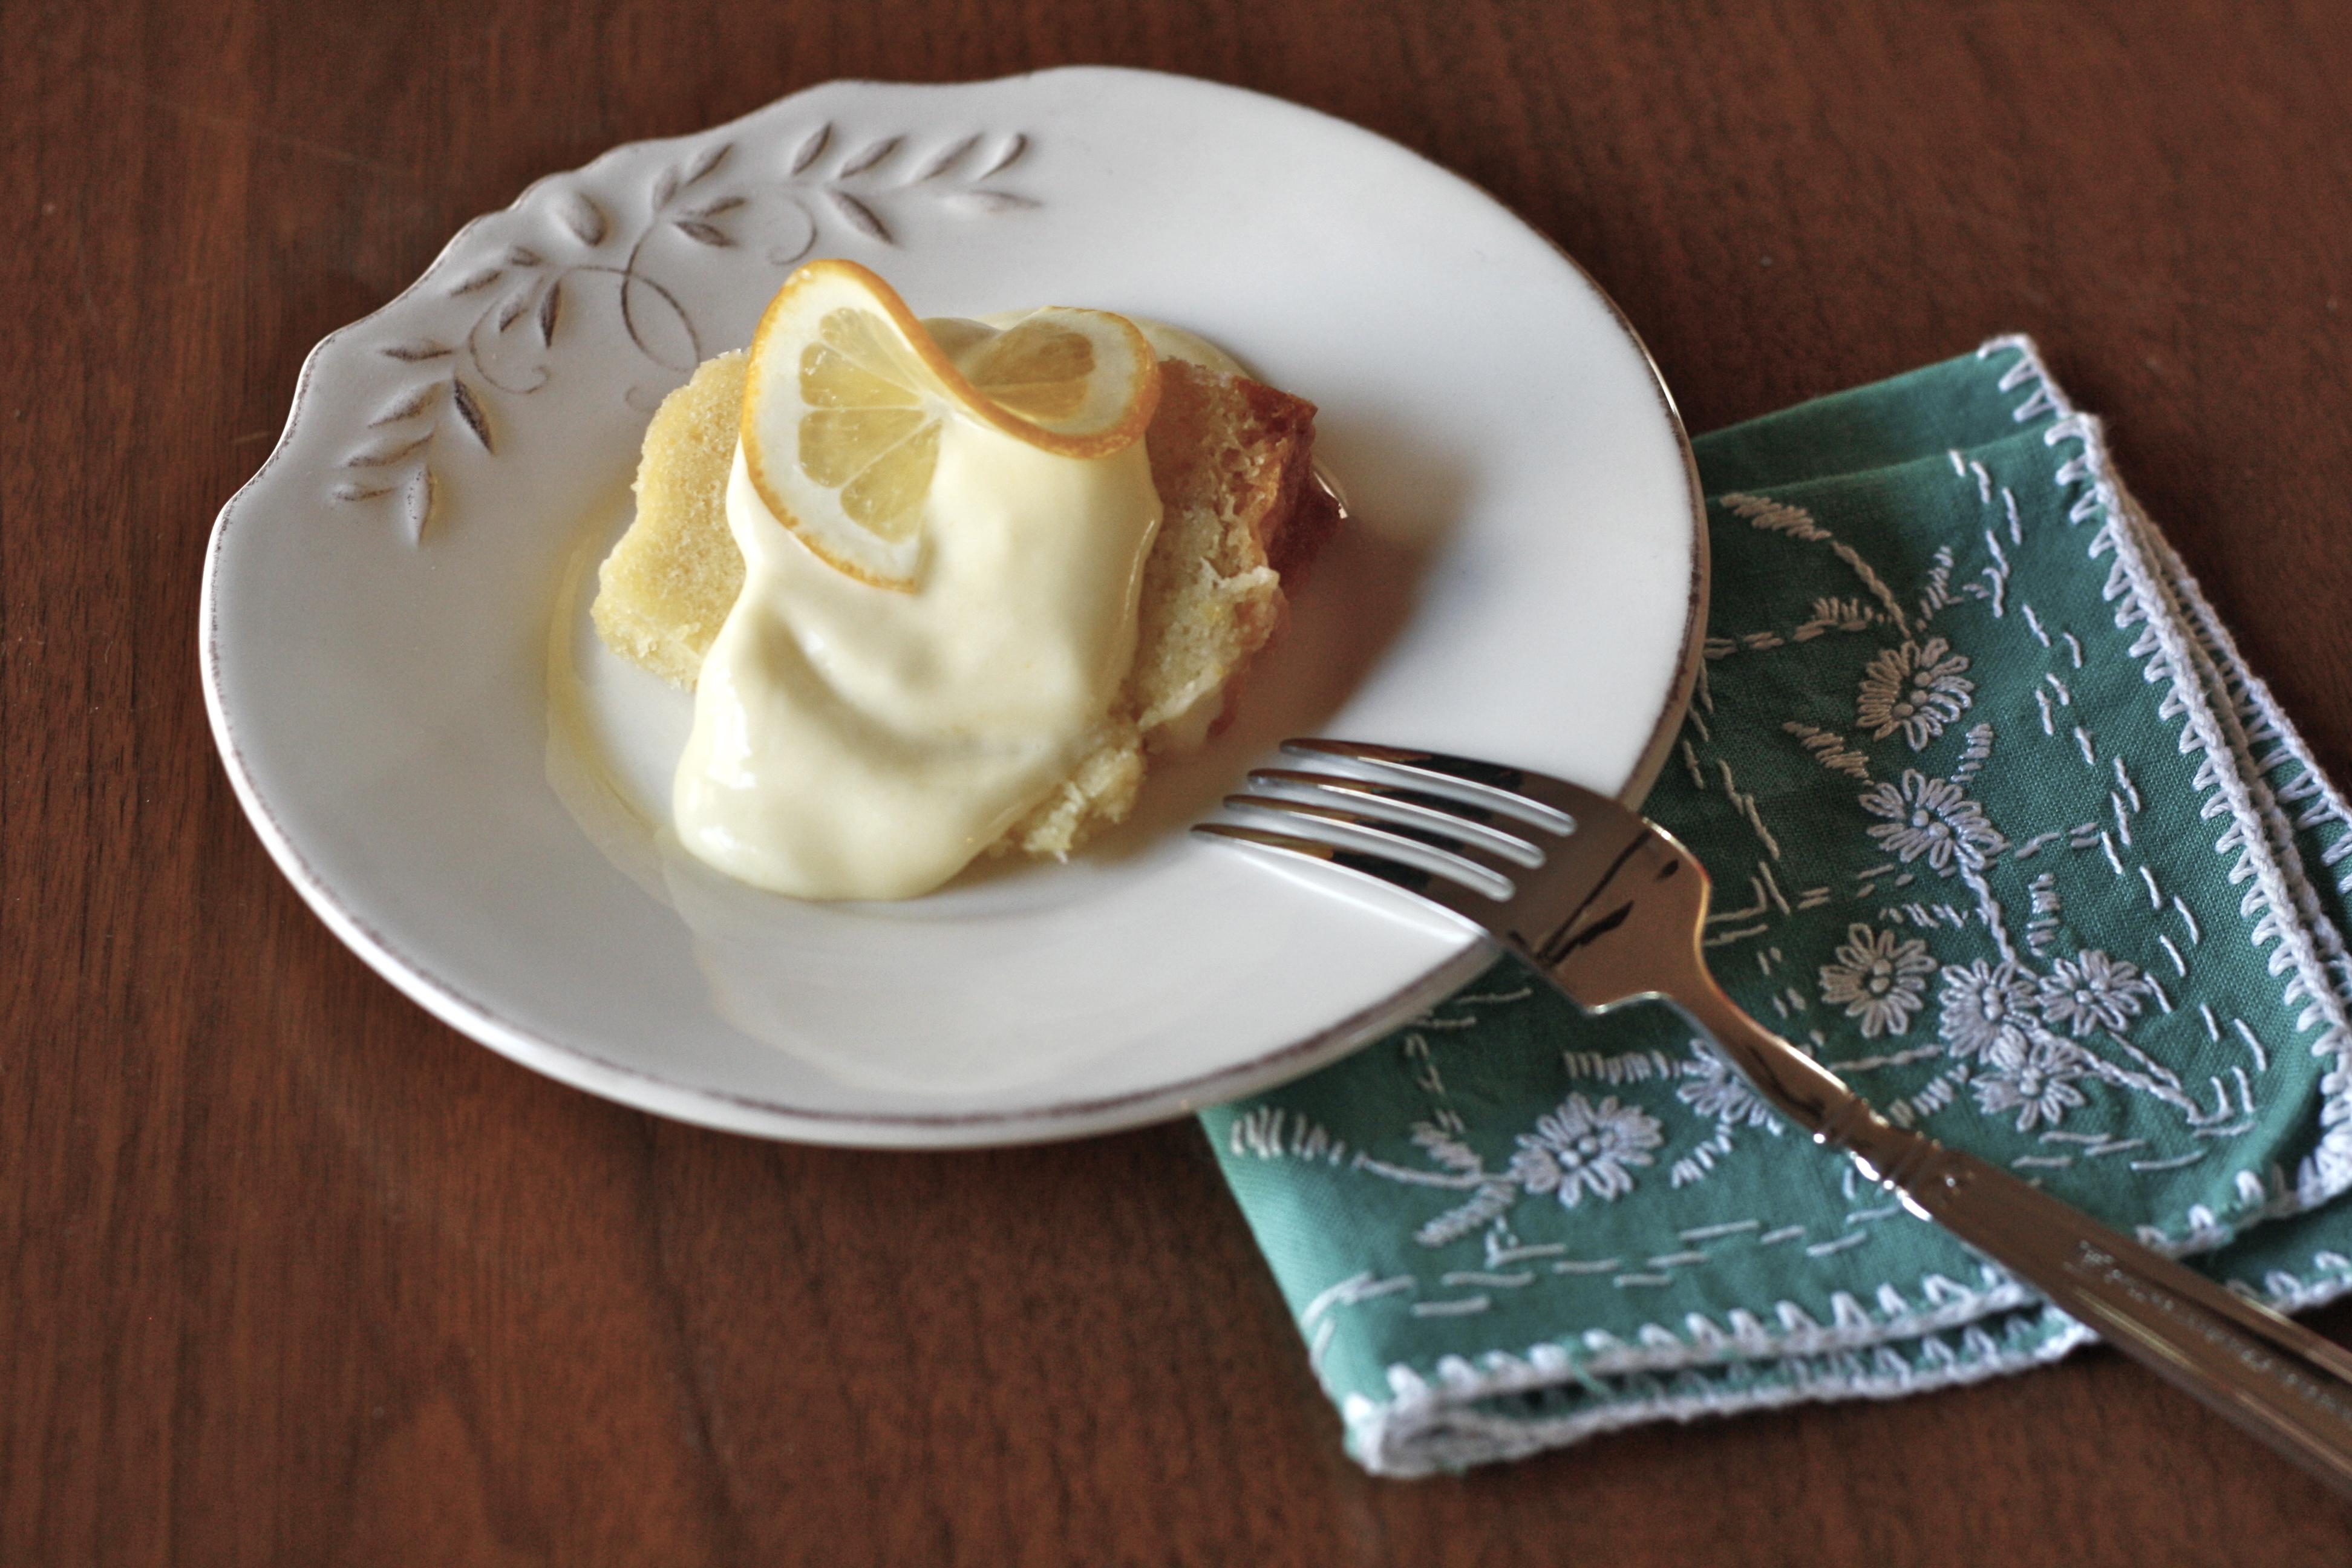 Meyers Lemon Pound Cake Mix